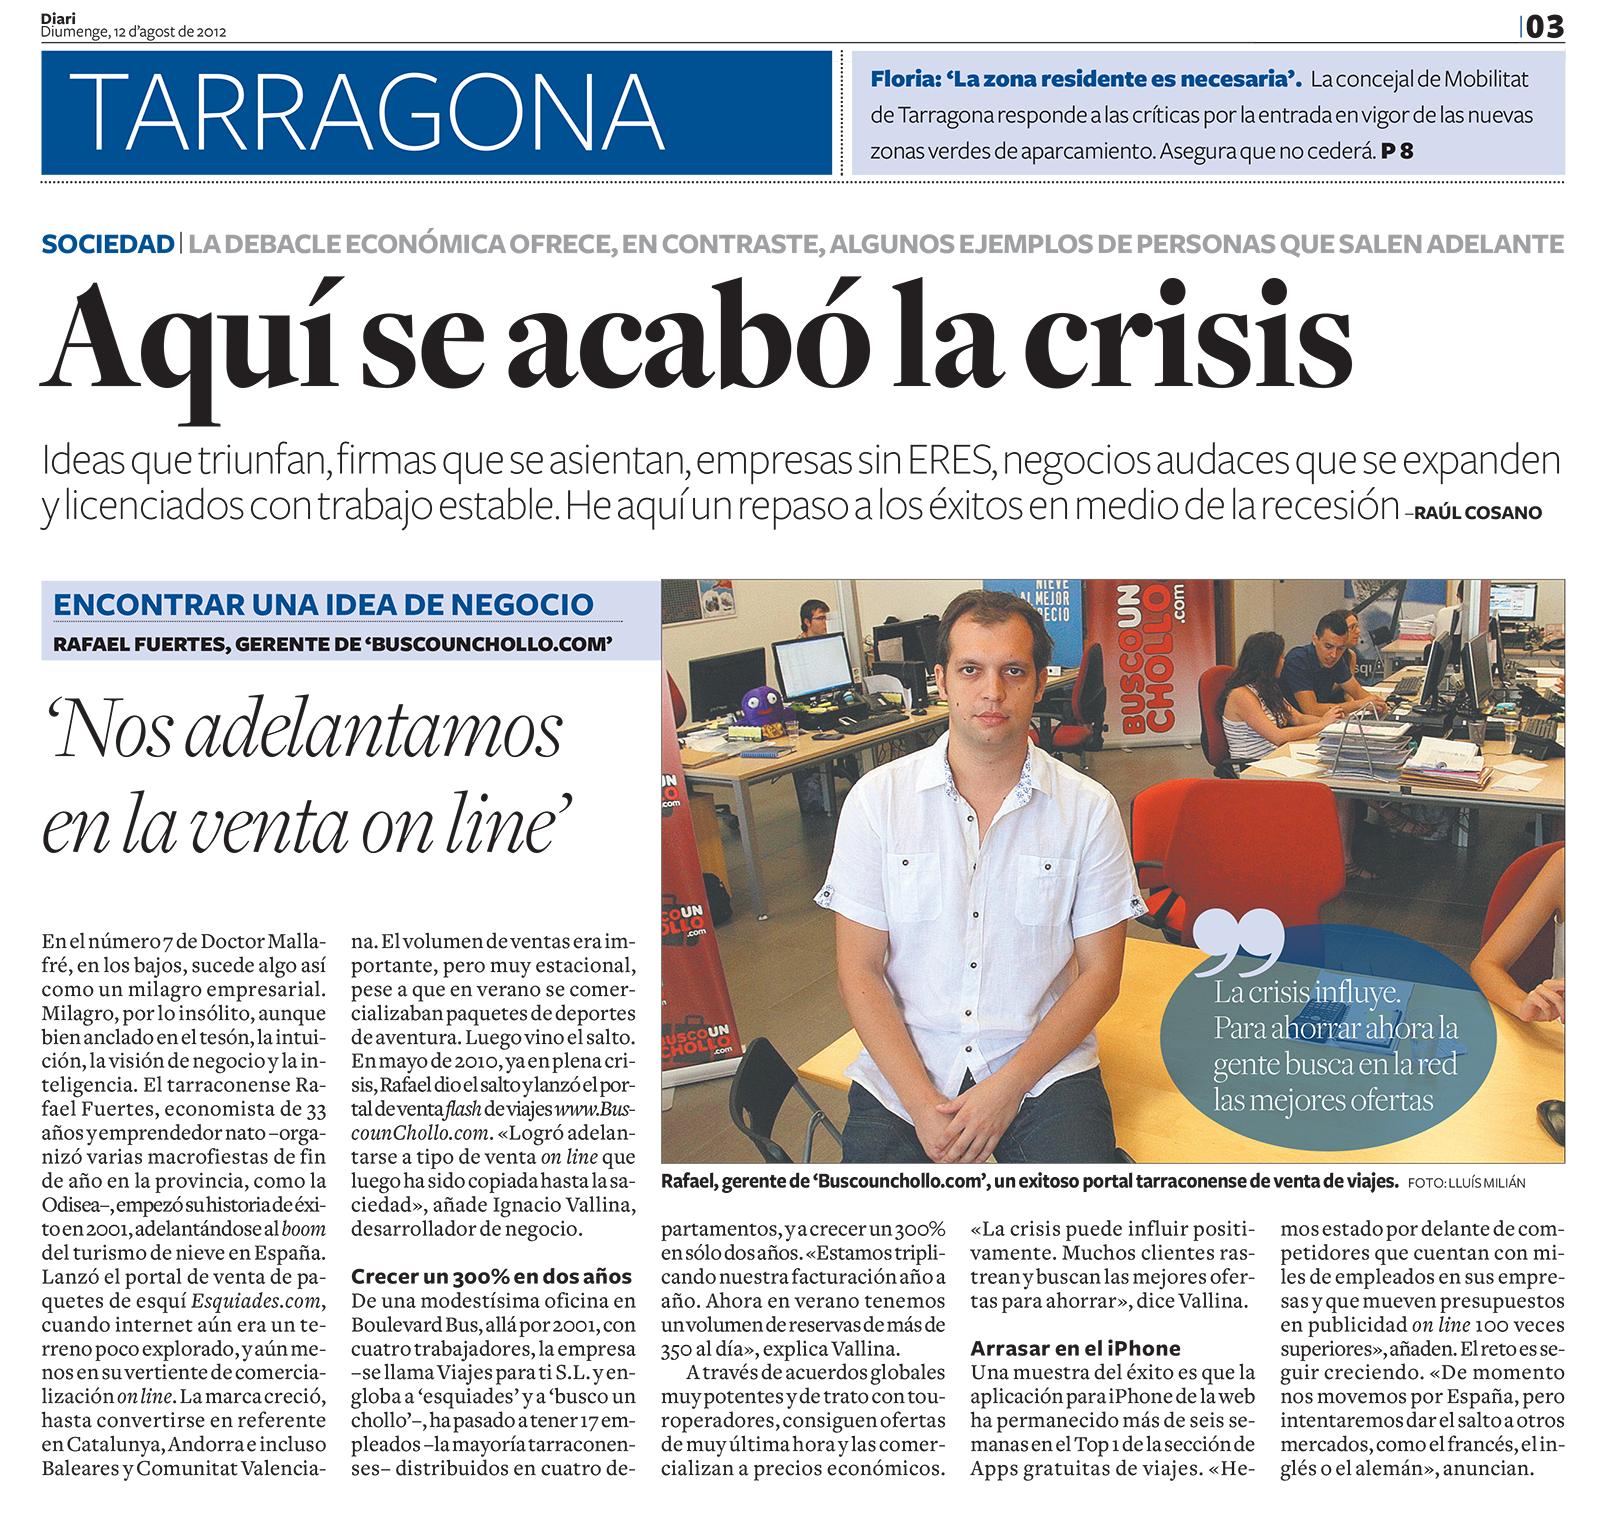 BuscoUnChollo.com en El Diari de Tarragona